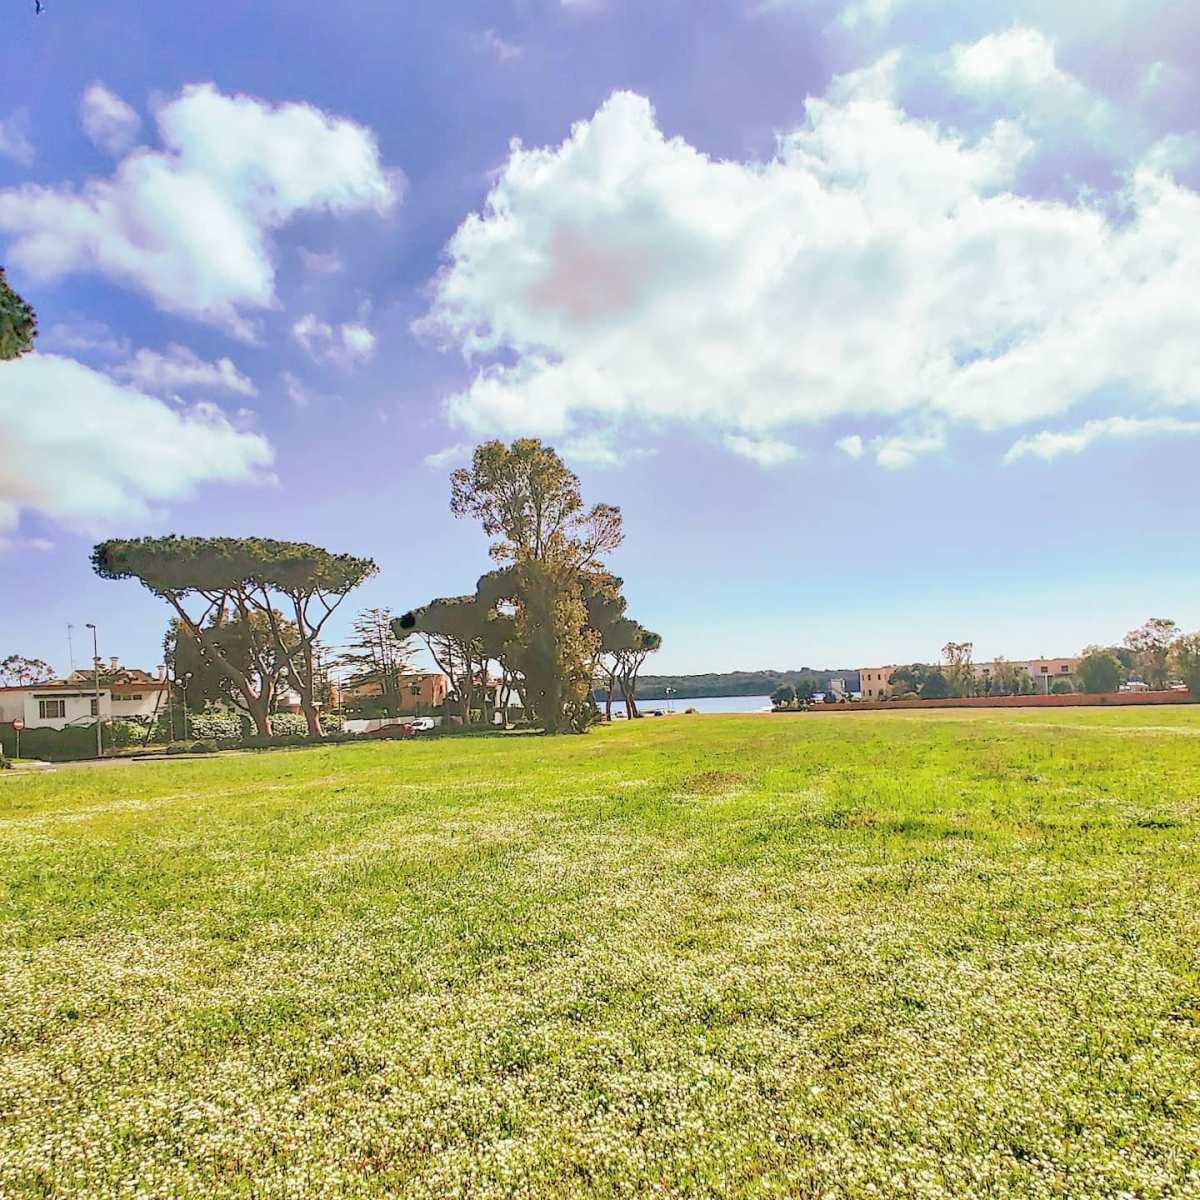 Spring vibes #sabaudia #italy #Italia #verde #natura #clouds #grass #nature #travel #naturegram #traveler #naturephotography #naturelover #travelphotography #traveltheworld #travelgram #traveller #travelling #traveling #naturelovers #natureza #green